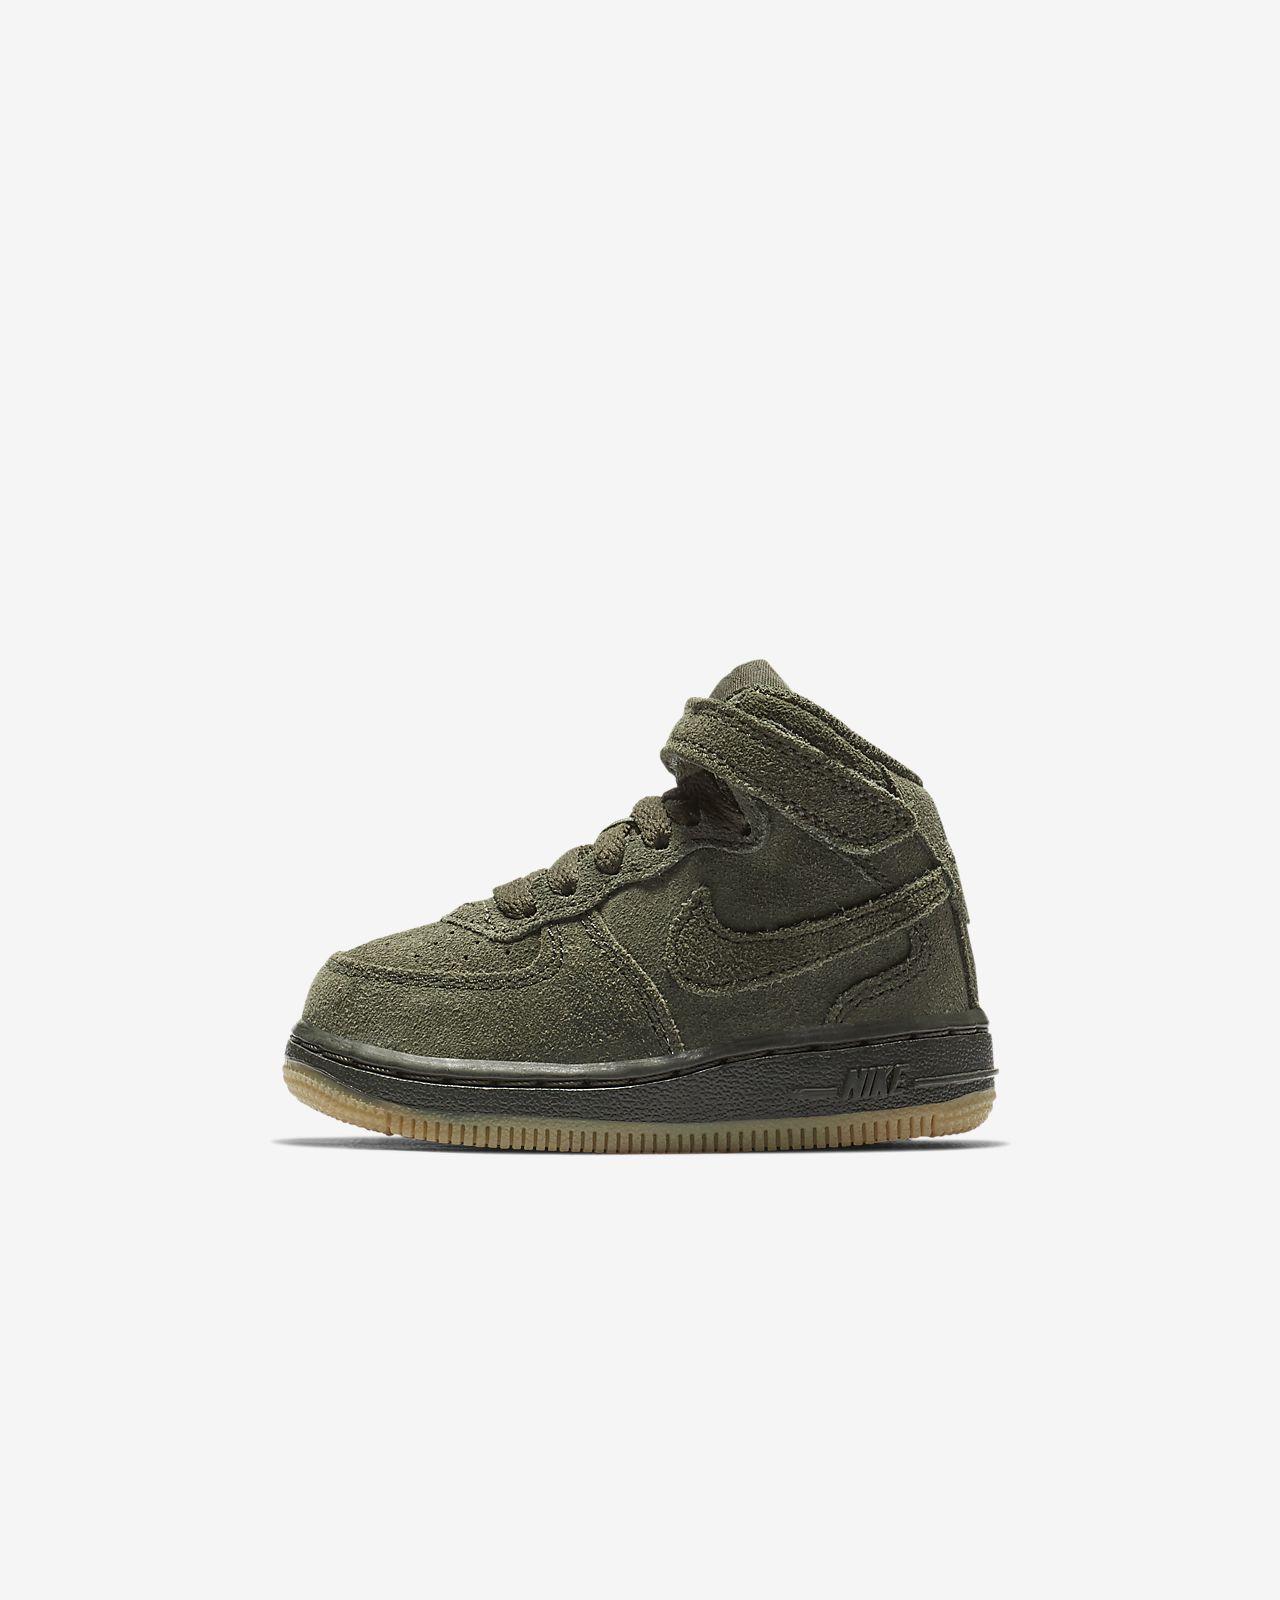 énorme réduction ec685 224fe Nike Air Force 1 Mid LV8 Baby/Toddler Shoe